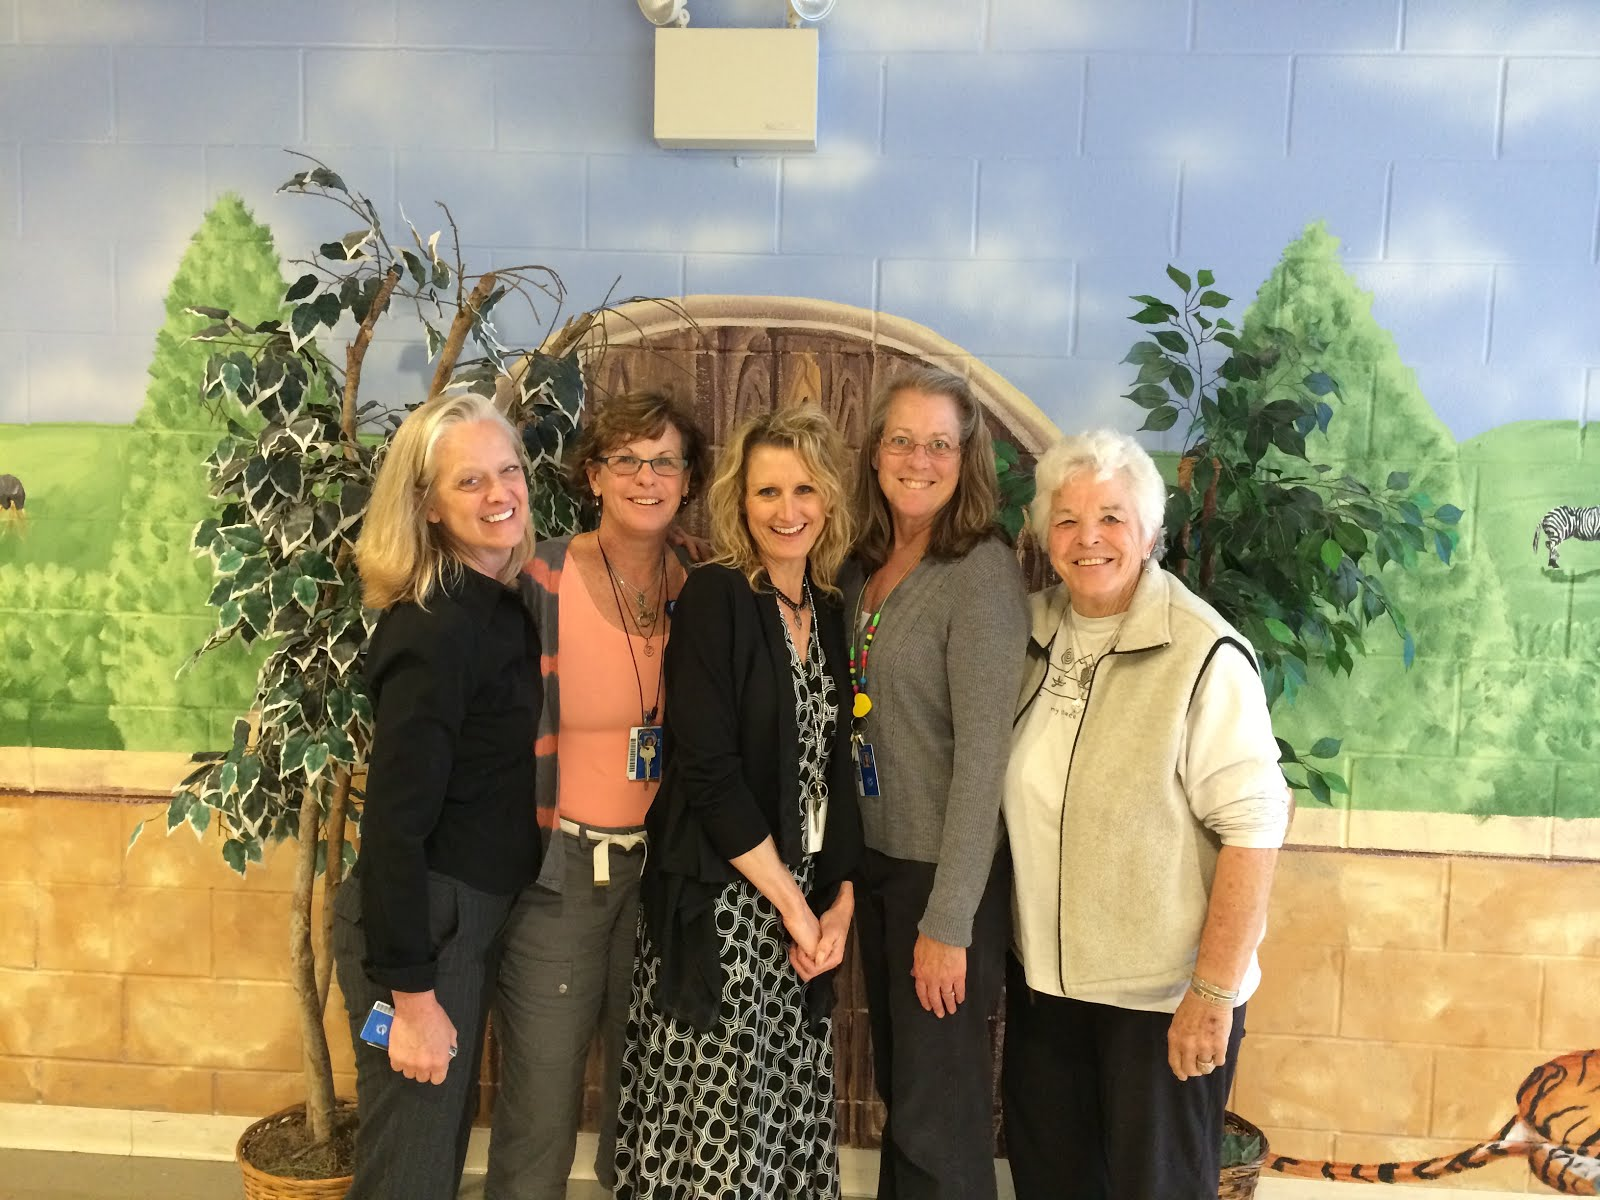 L-R: Hope McCarthy, Cathy Kitterman, Wendy Kirk, Fran O'Brien, and Sue Carpenter.